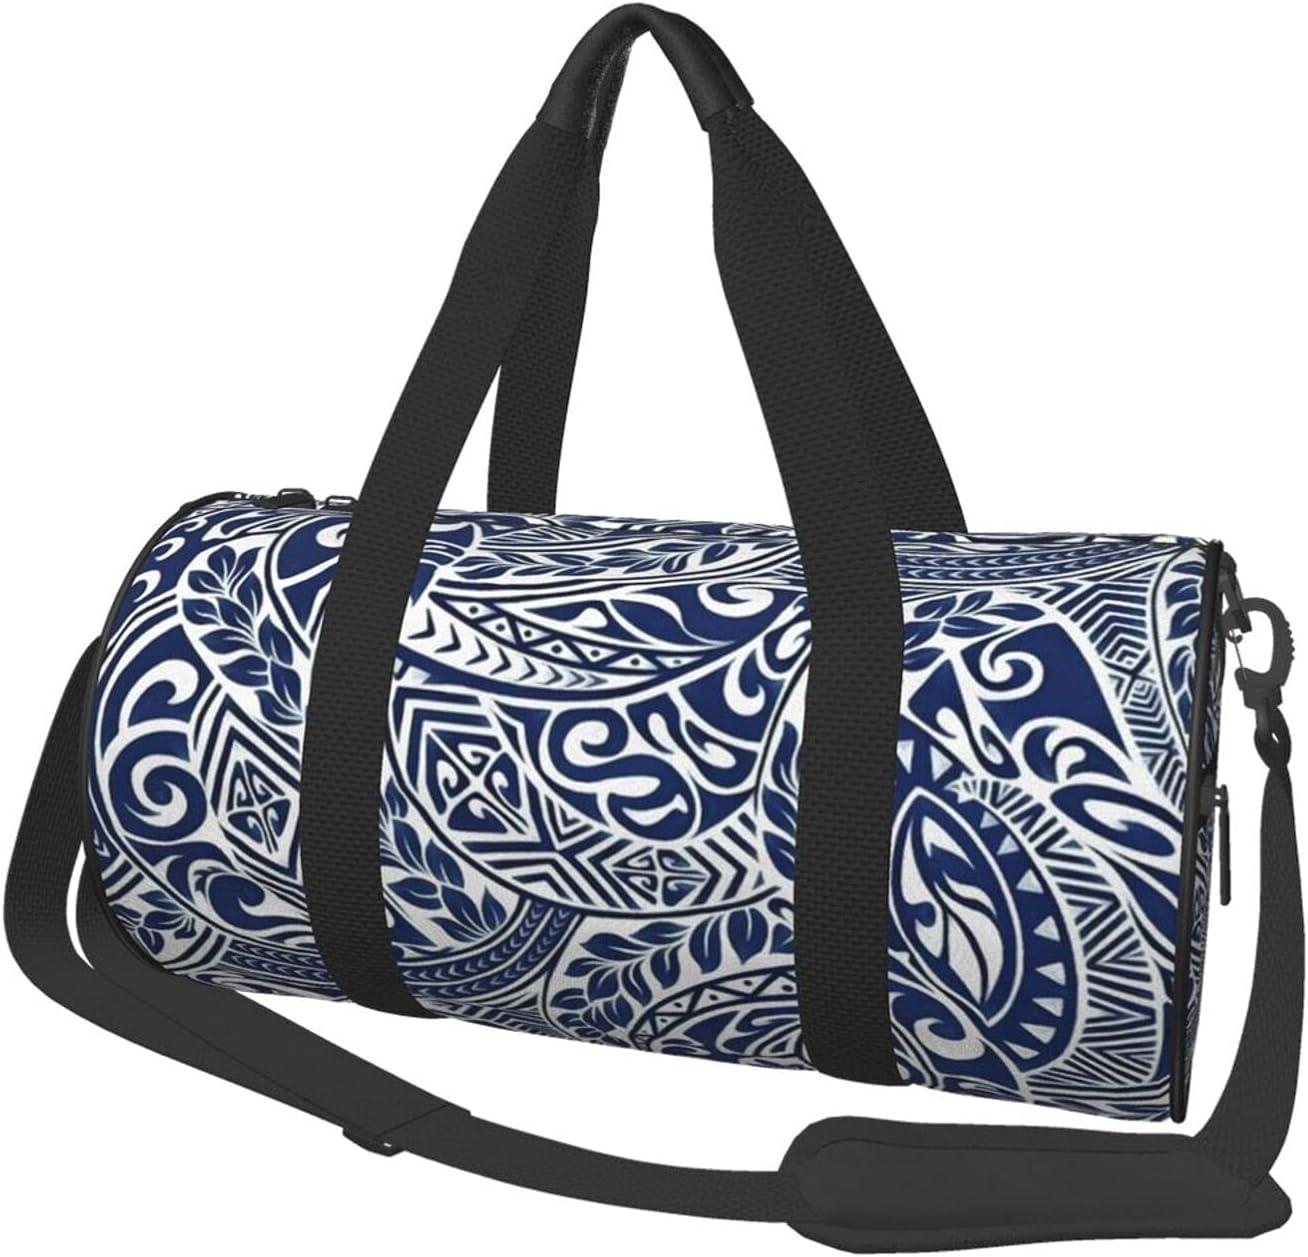 Round Sports Gym Bag Hawaiian Ranking TOP12 Handbag Sh Cheap mail order sales Yoga Pattern Tribal